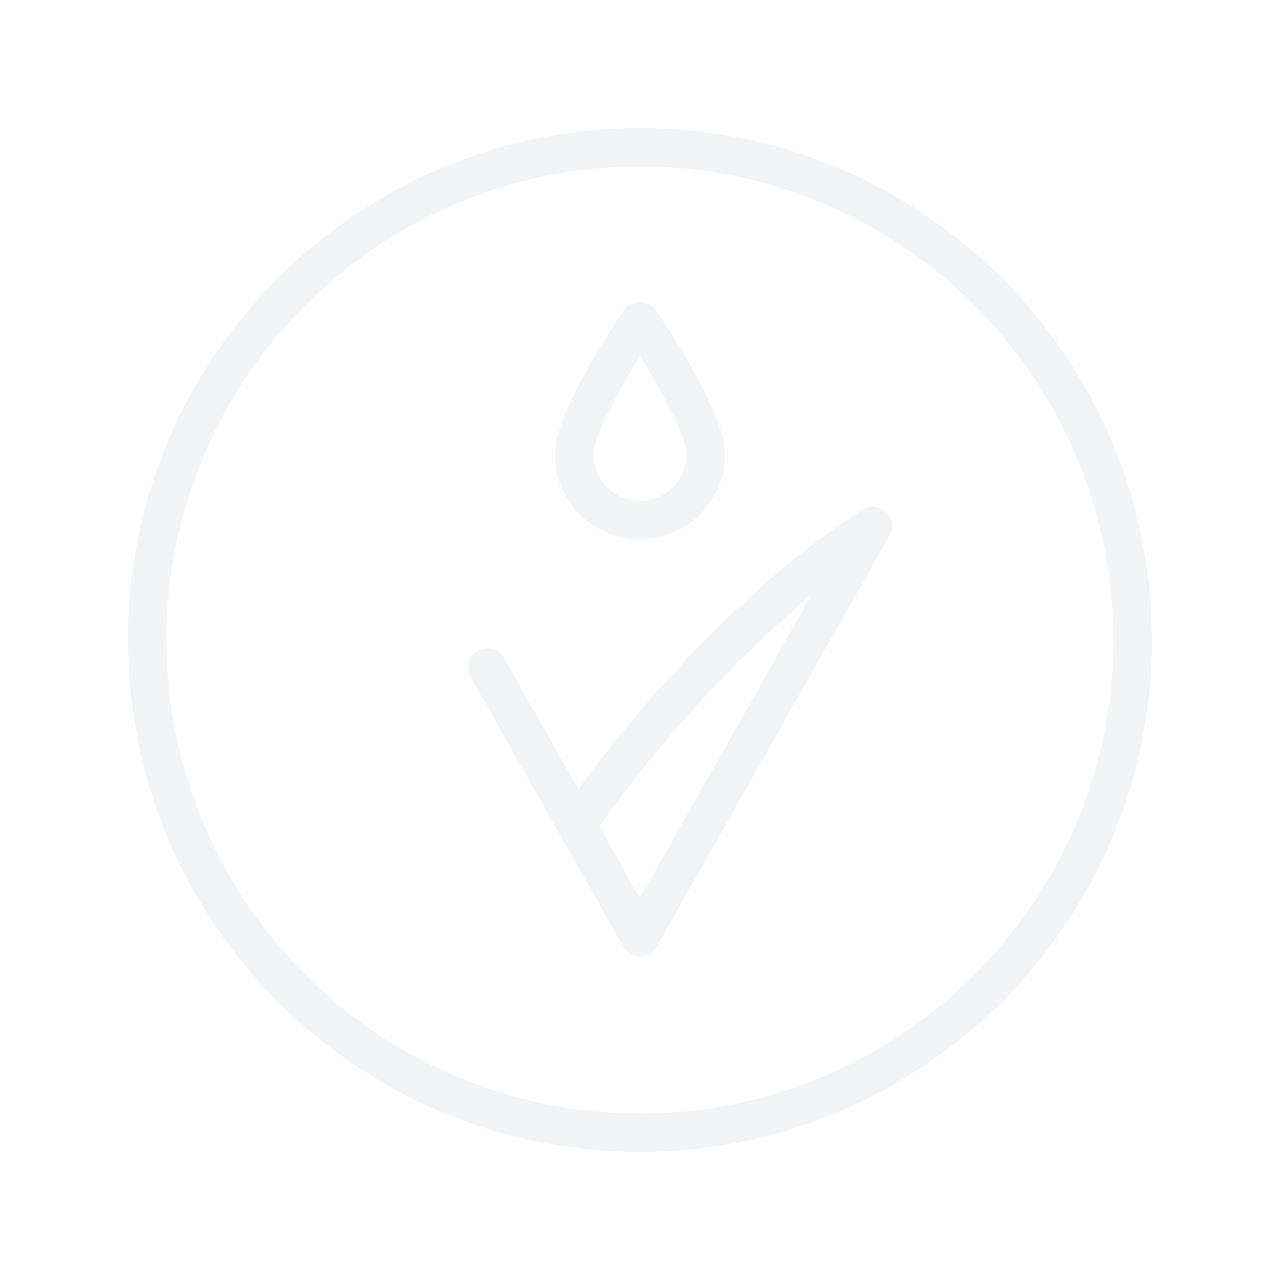 JOIK ORGANIC Rejuvenating Beauty Elixir 30ml